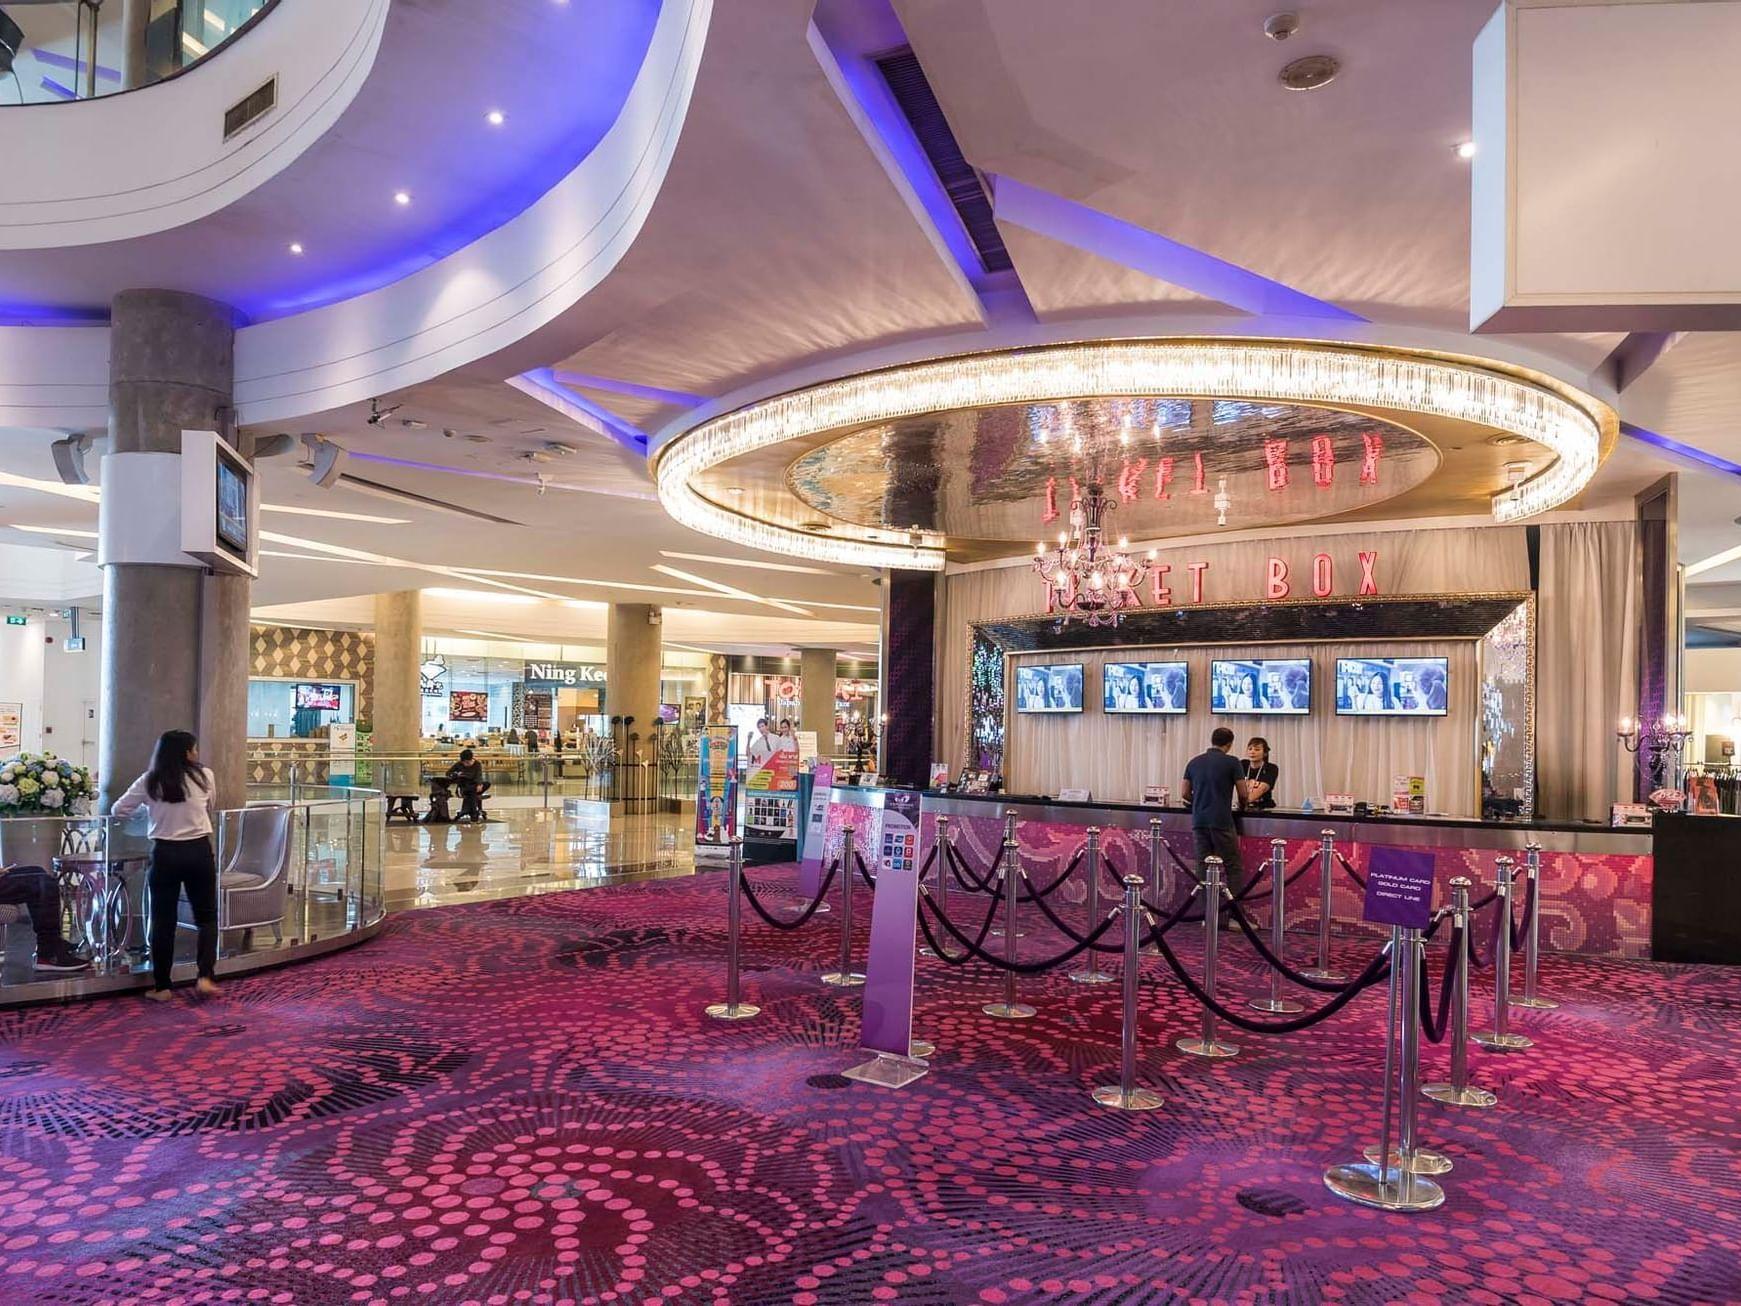 The Esplanade Shopping Mall and Rachadalai Theatre near Emporium Suites by Chatrium